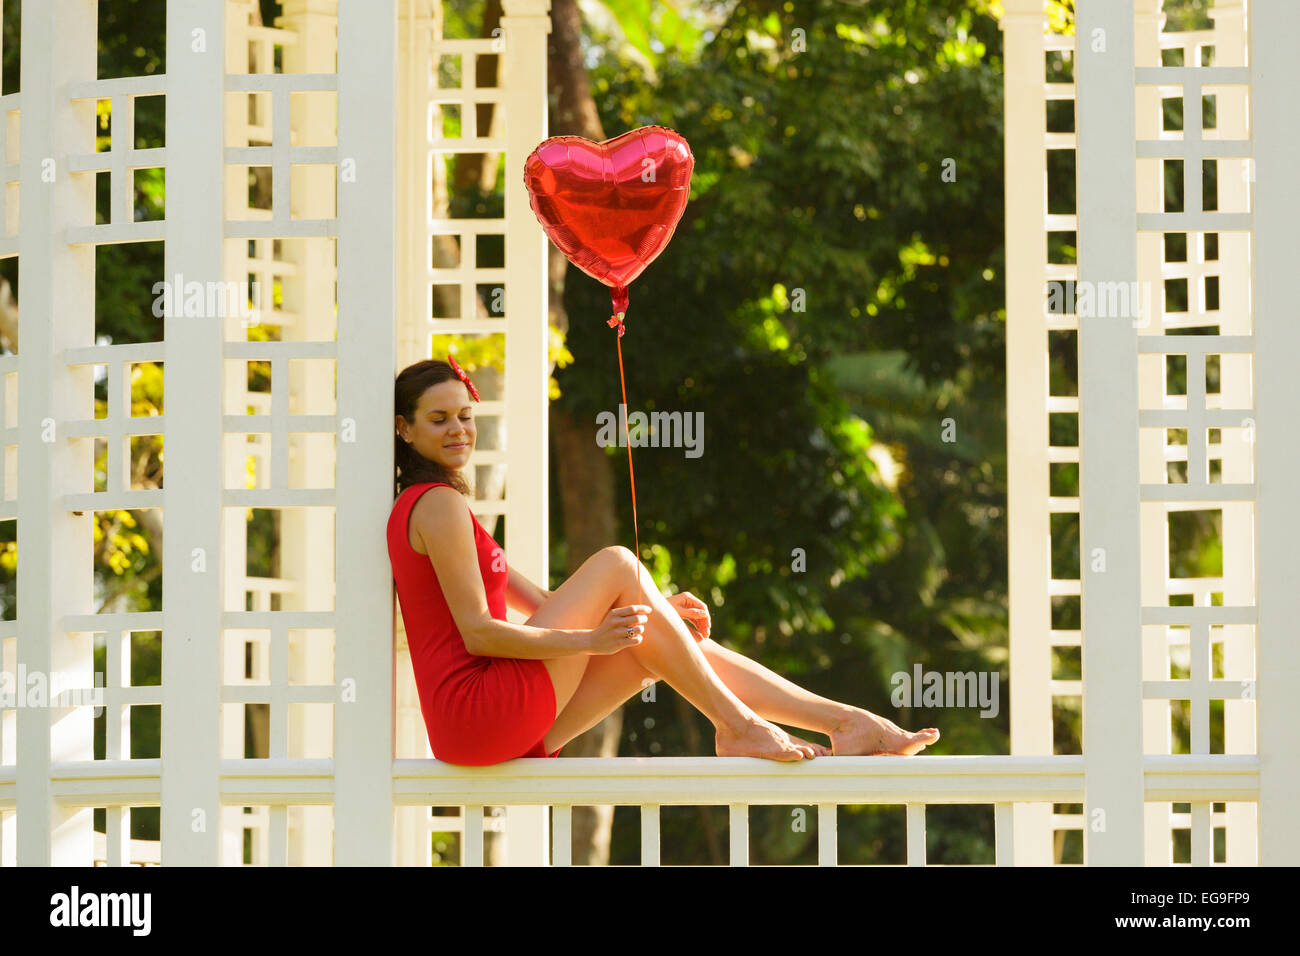 Frau mit roter Herzballon Form auf Parkbank sitzen Stockbild